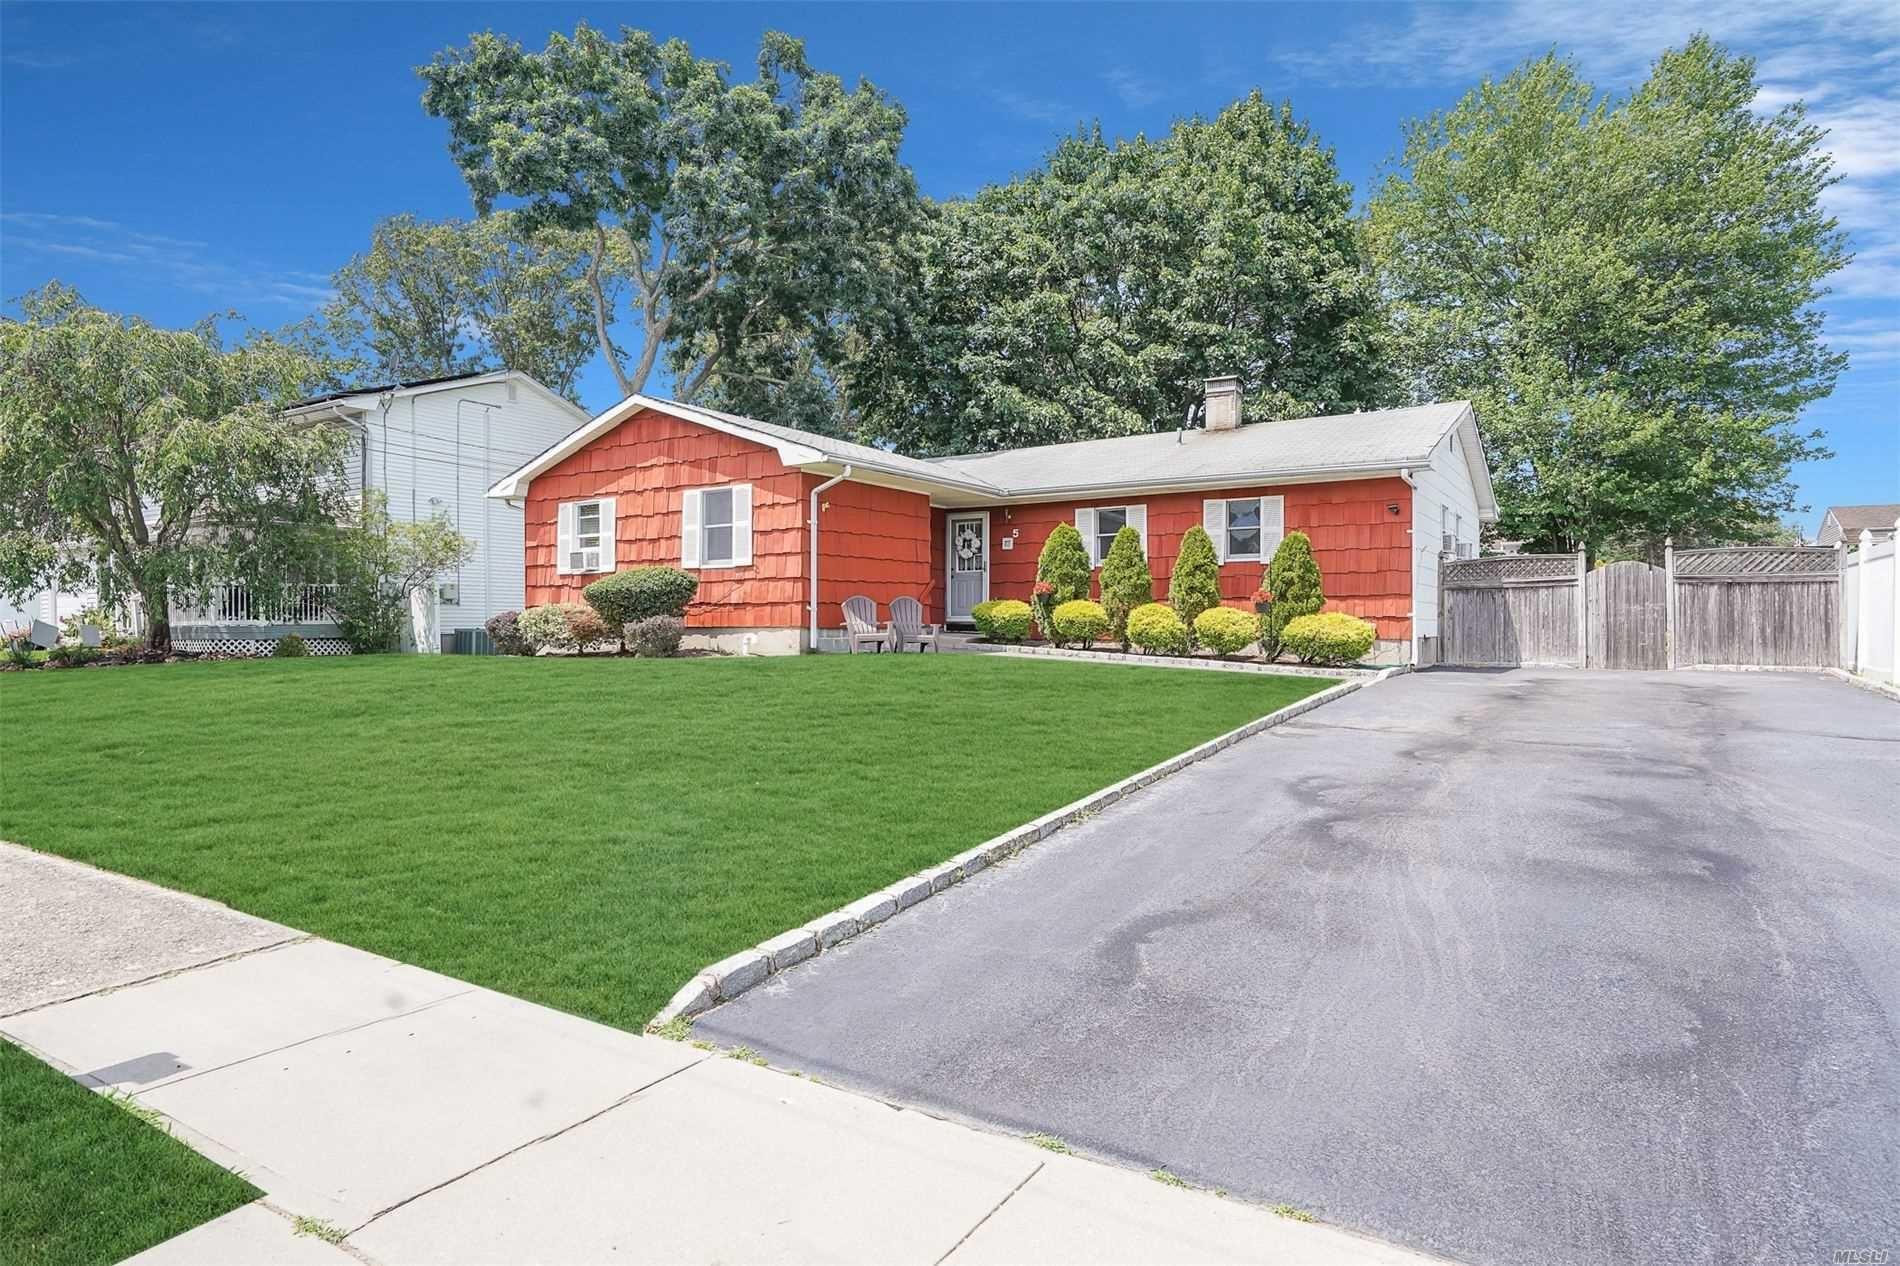 5 Sutton Place, Ronkonkoma, NY 11779 - MLS#: 3239471